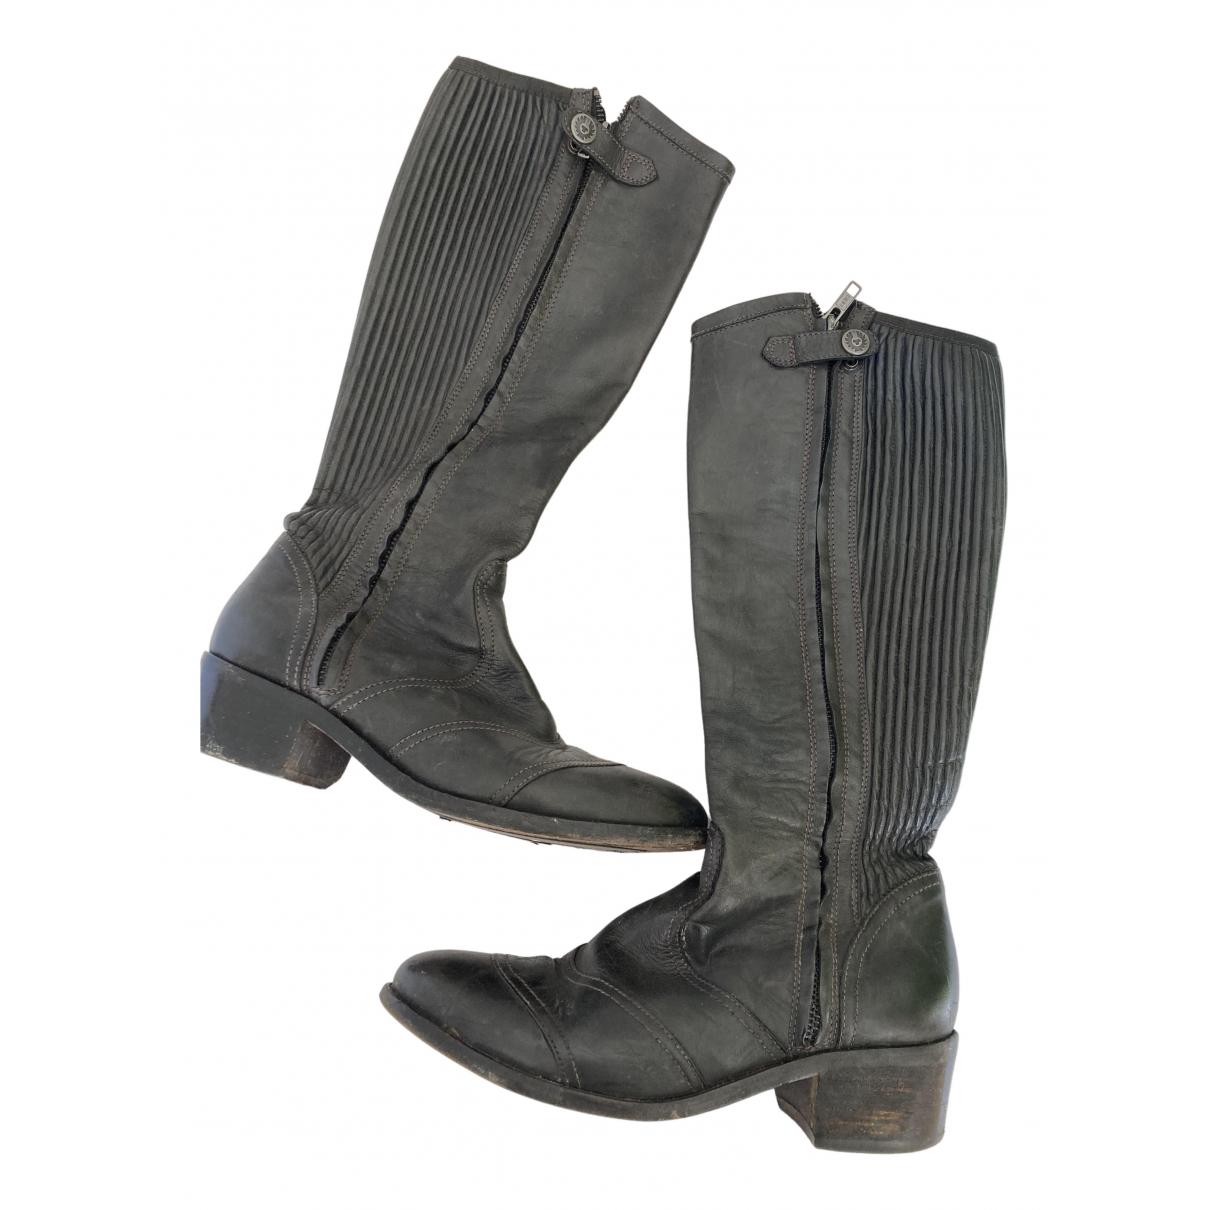 Belstaff N Brown Leather Boots for Women 39 EU